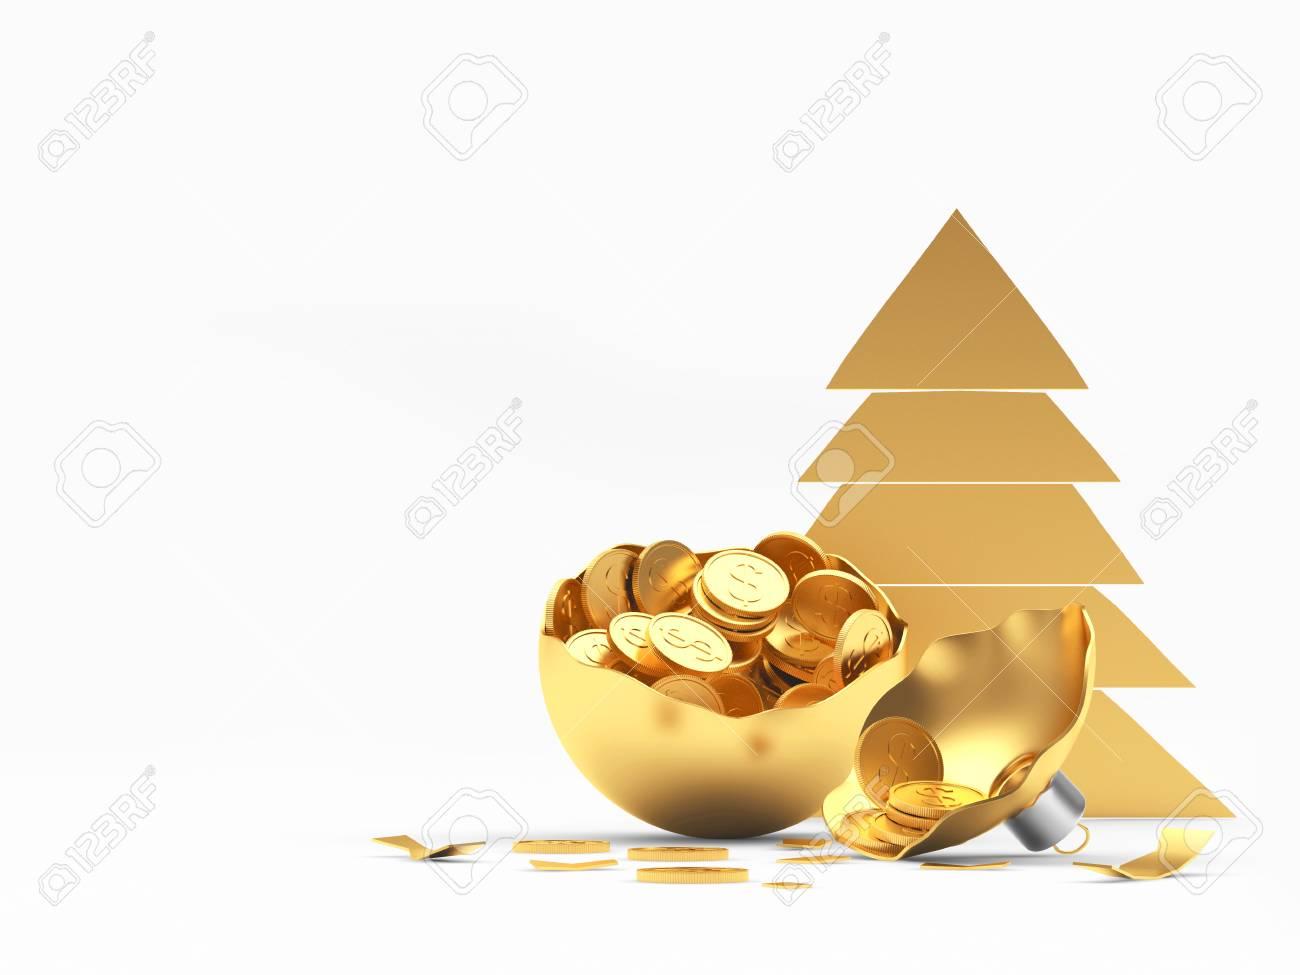 Golden Christmas Tree Icon And Broken Christmas Ball Full Of Stock